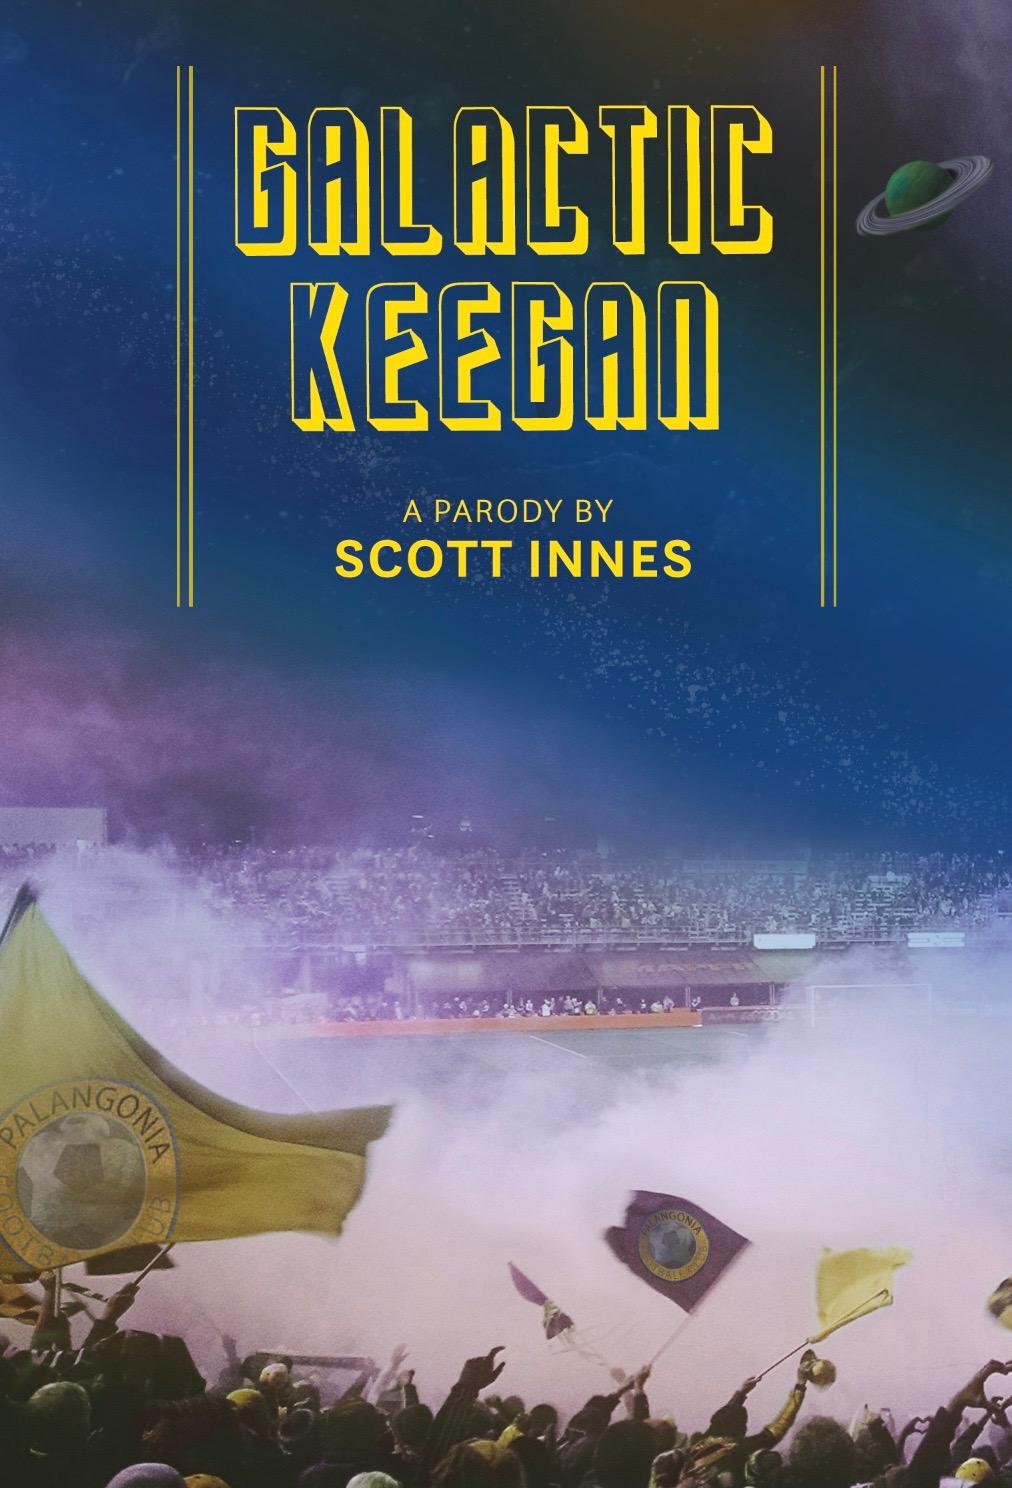 galactic-keegan-scott-innes